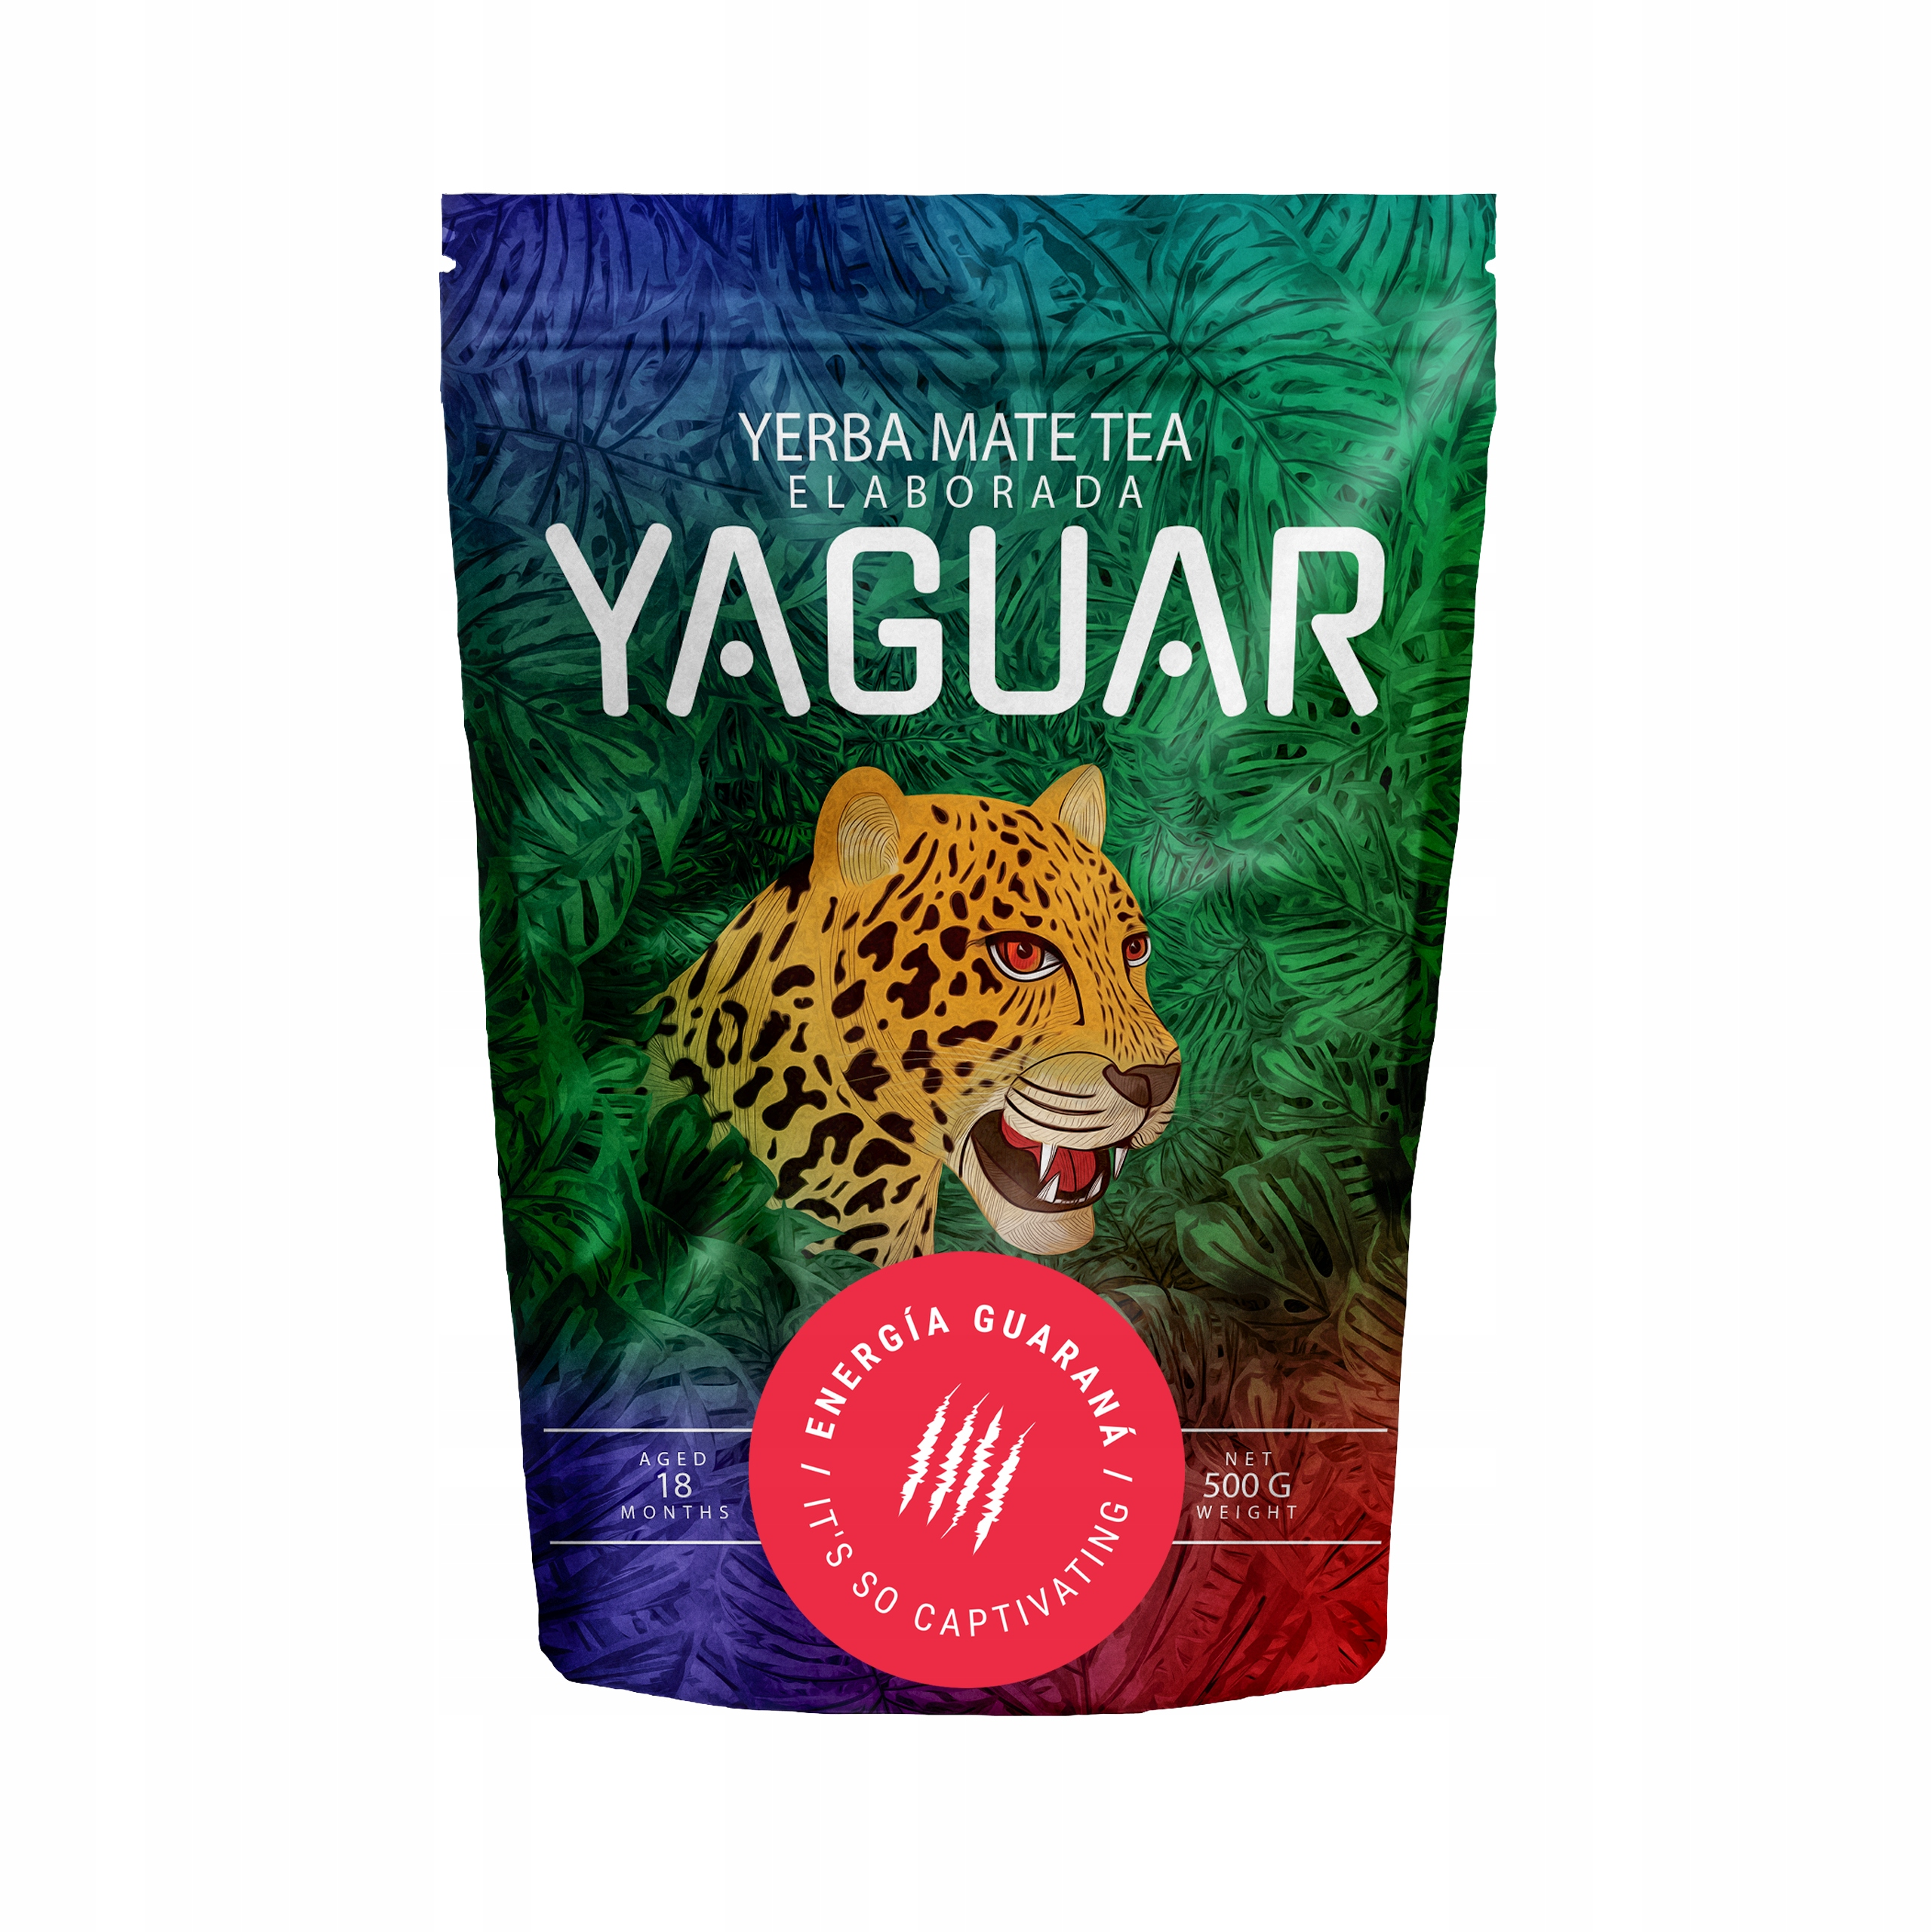 Yerba Mate Yaguar Энергия Гуарана Ноль ,5 кг 500 г крепкая